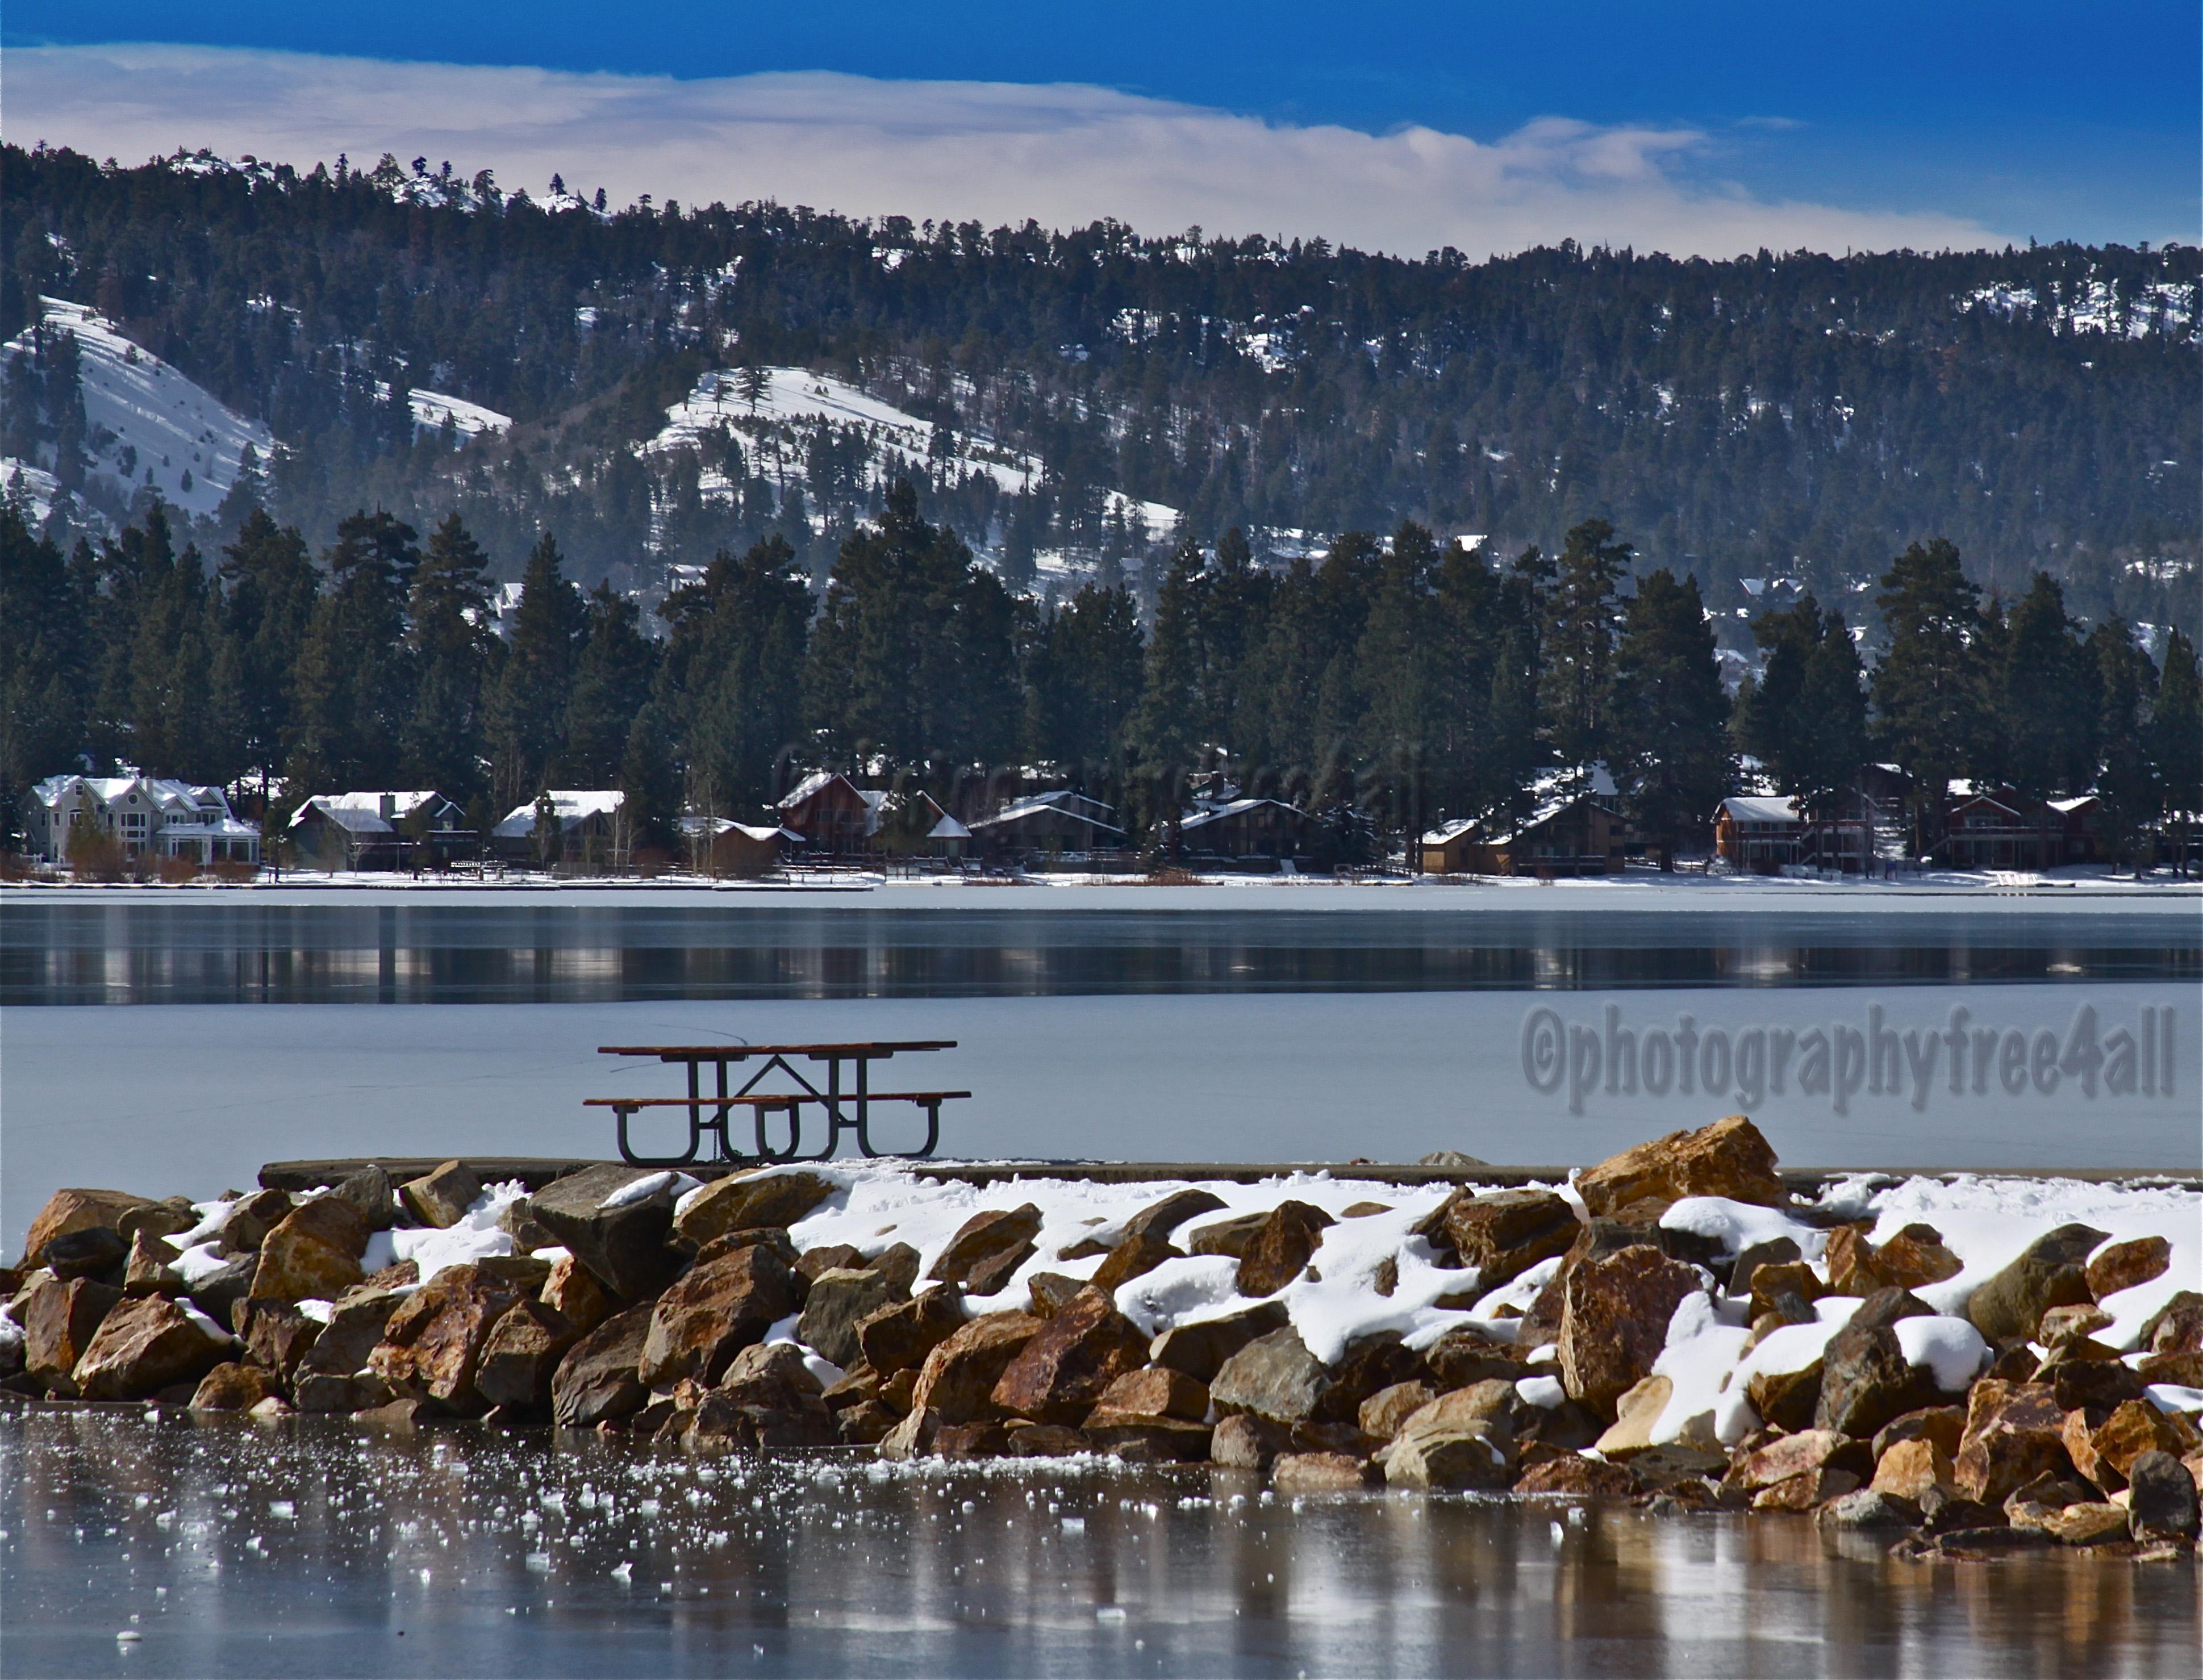 big bear lake a winter wonderland photographyfree4all. Black Bedroom Furniture Sets. Home Design Ideas